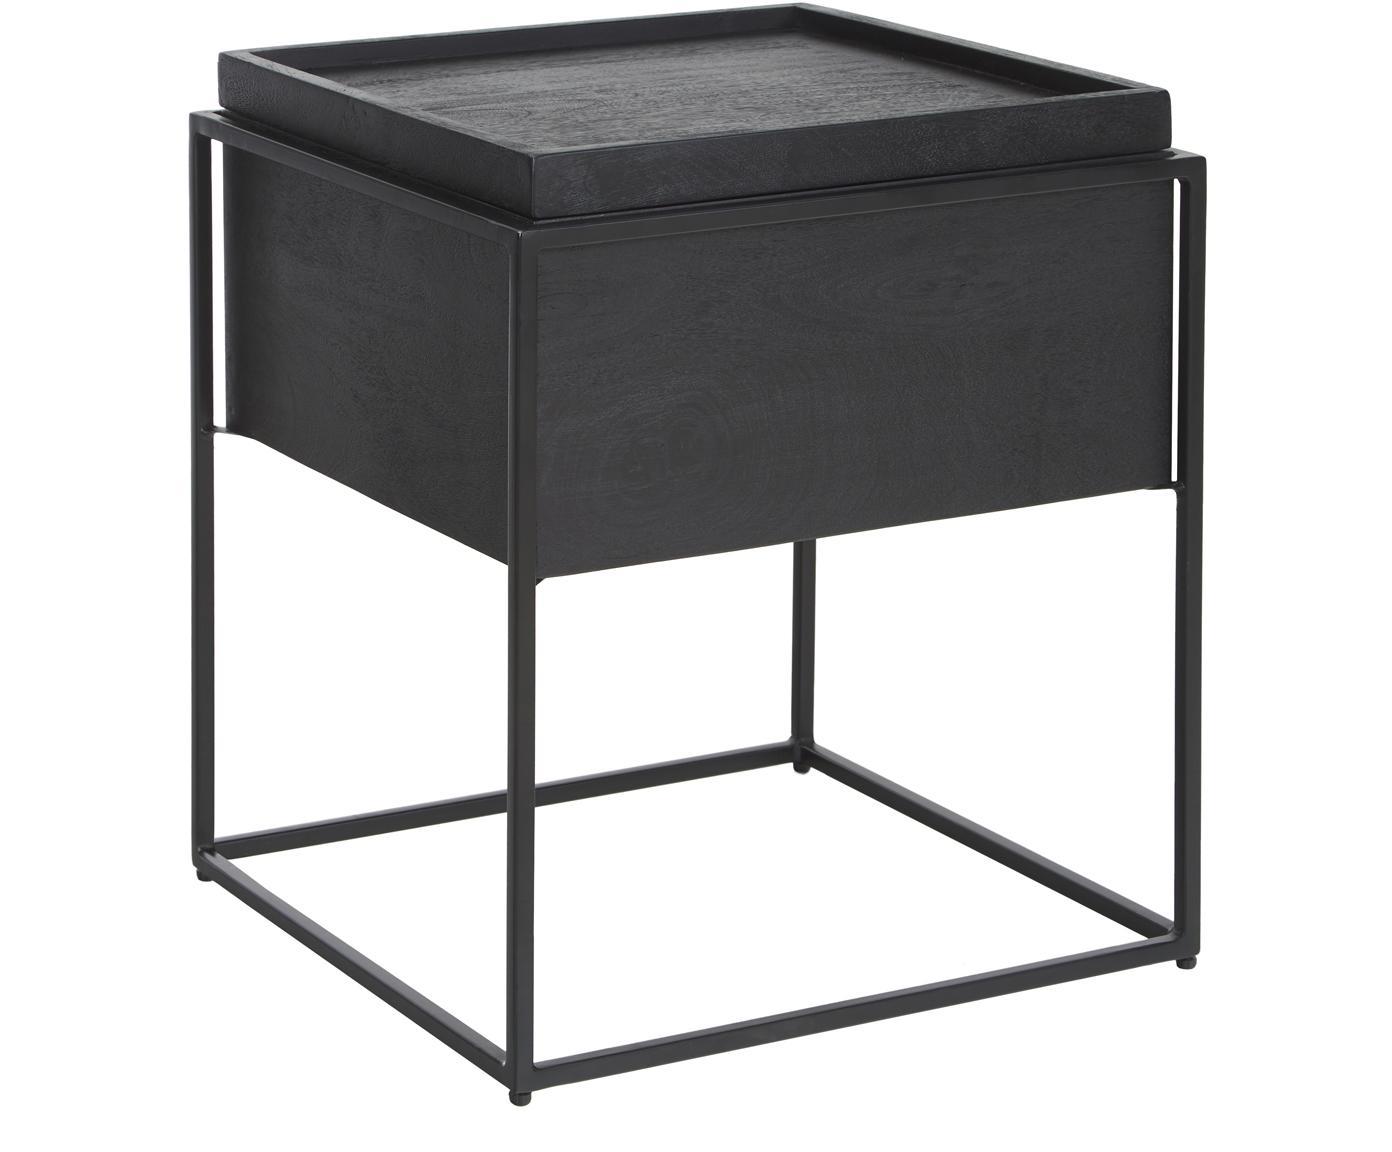 Mesa auxiliar Theo, con espacio de almacenamiento, Estructura: madera de mango maciza pi, Estructura: metal con pintura en polv, Negro, An 45 x Al 50 cm